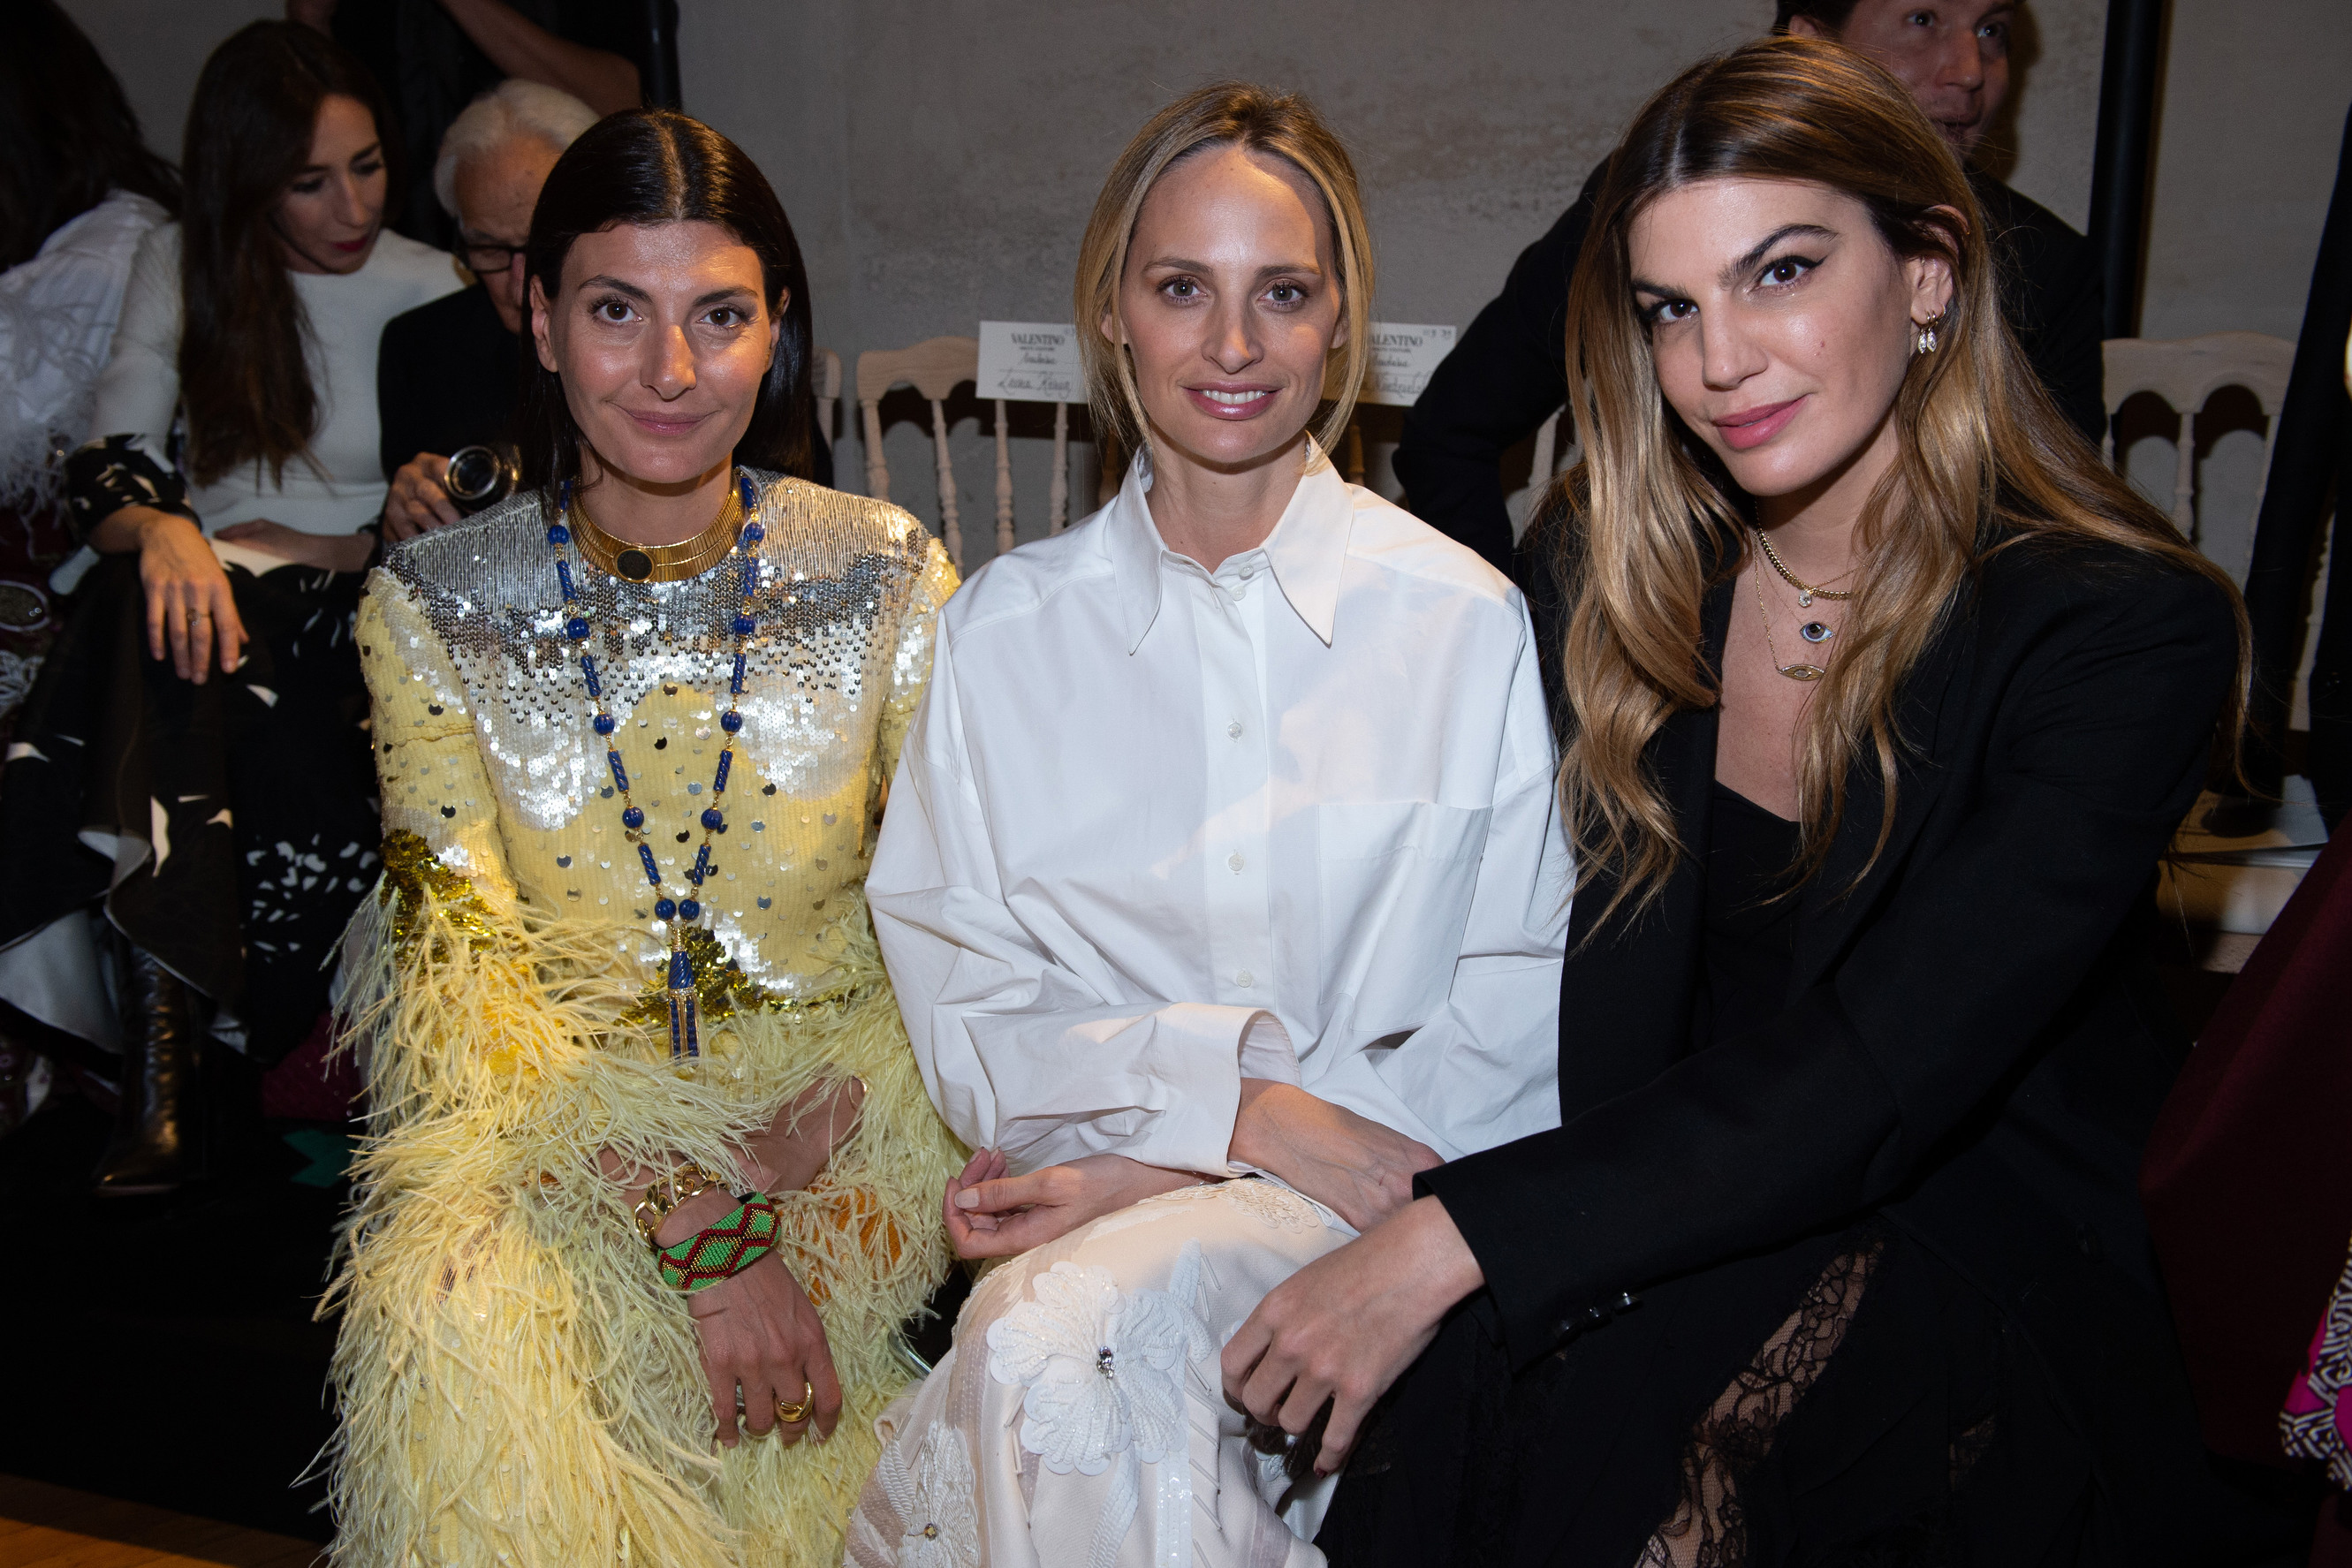 Giovanna Battaglia, Lauren Santo Domingo et Bianca Brandolini D'Abba